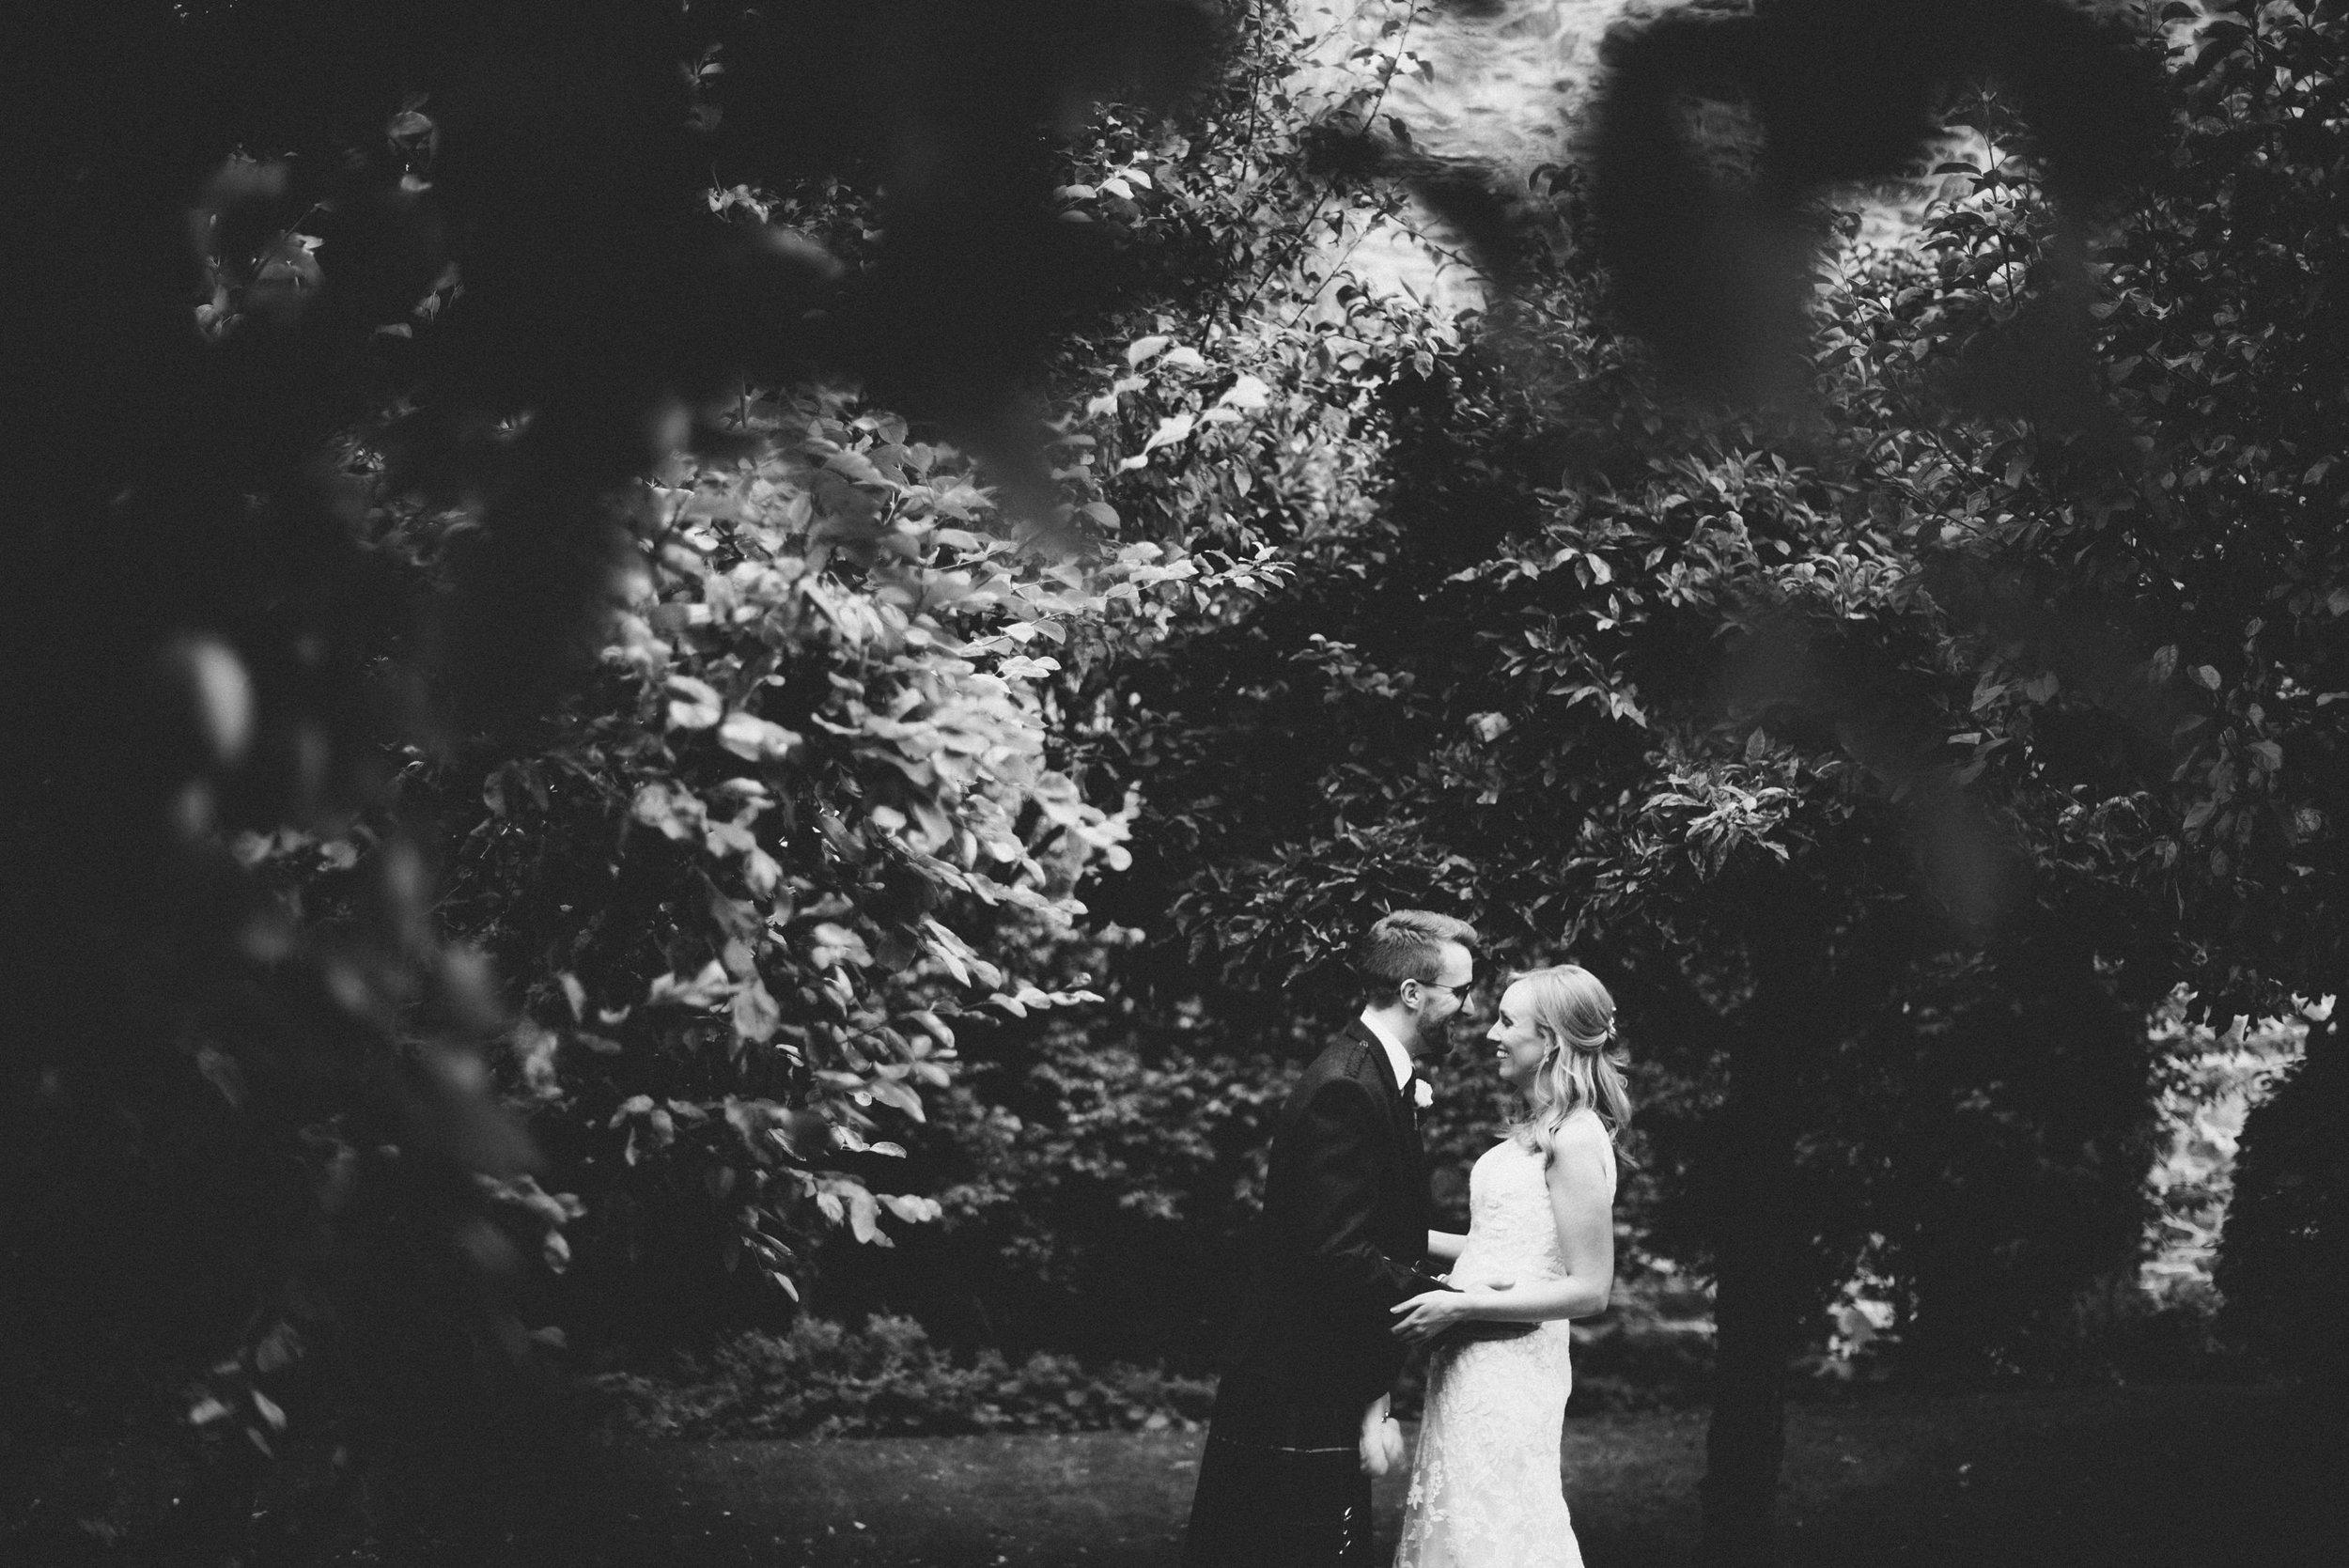 0100-LISA-DEVINE-PHOTOGRAPHY-ALTERNATIVE-WEDDING-PHOTOGRAPHY-SCOTLAND-DESTINATION-WEDDINGS-GLASGOW-WEDDINGS-COOL-WEDDINGS-STYLISH-WEDDINGS.JPG